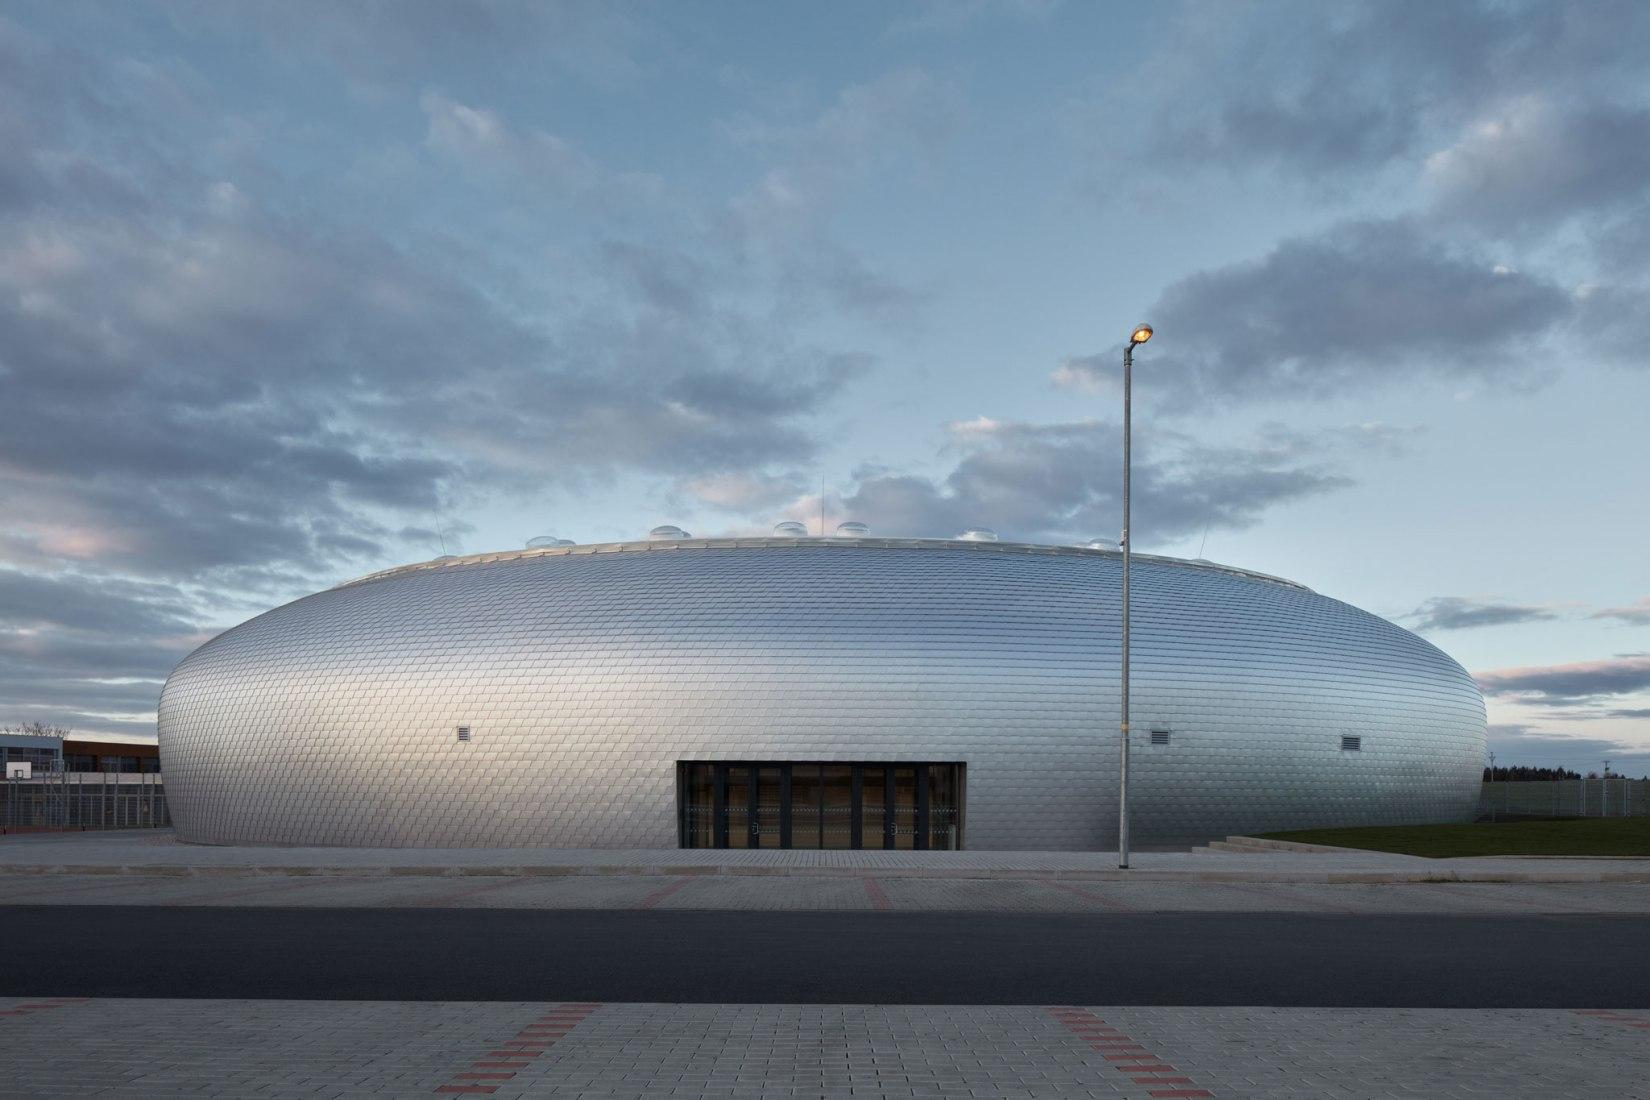 Exterior. Pabellón deportivo de Dolní Brežany por SPORADICAL. Fotografía © Jakub Skokan, Martin Tůma / BoysPlayNice